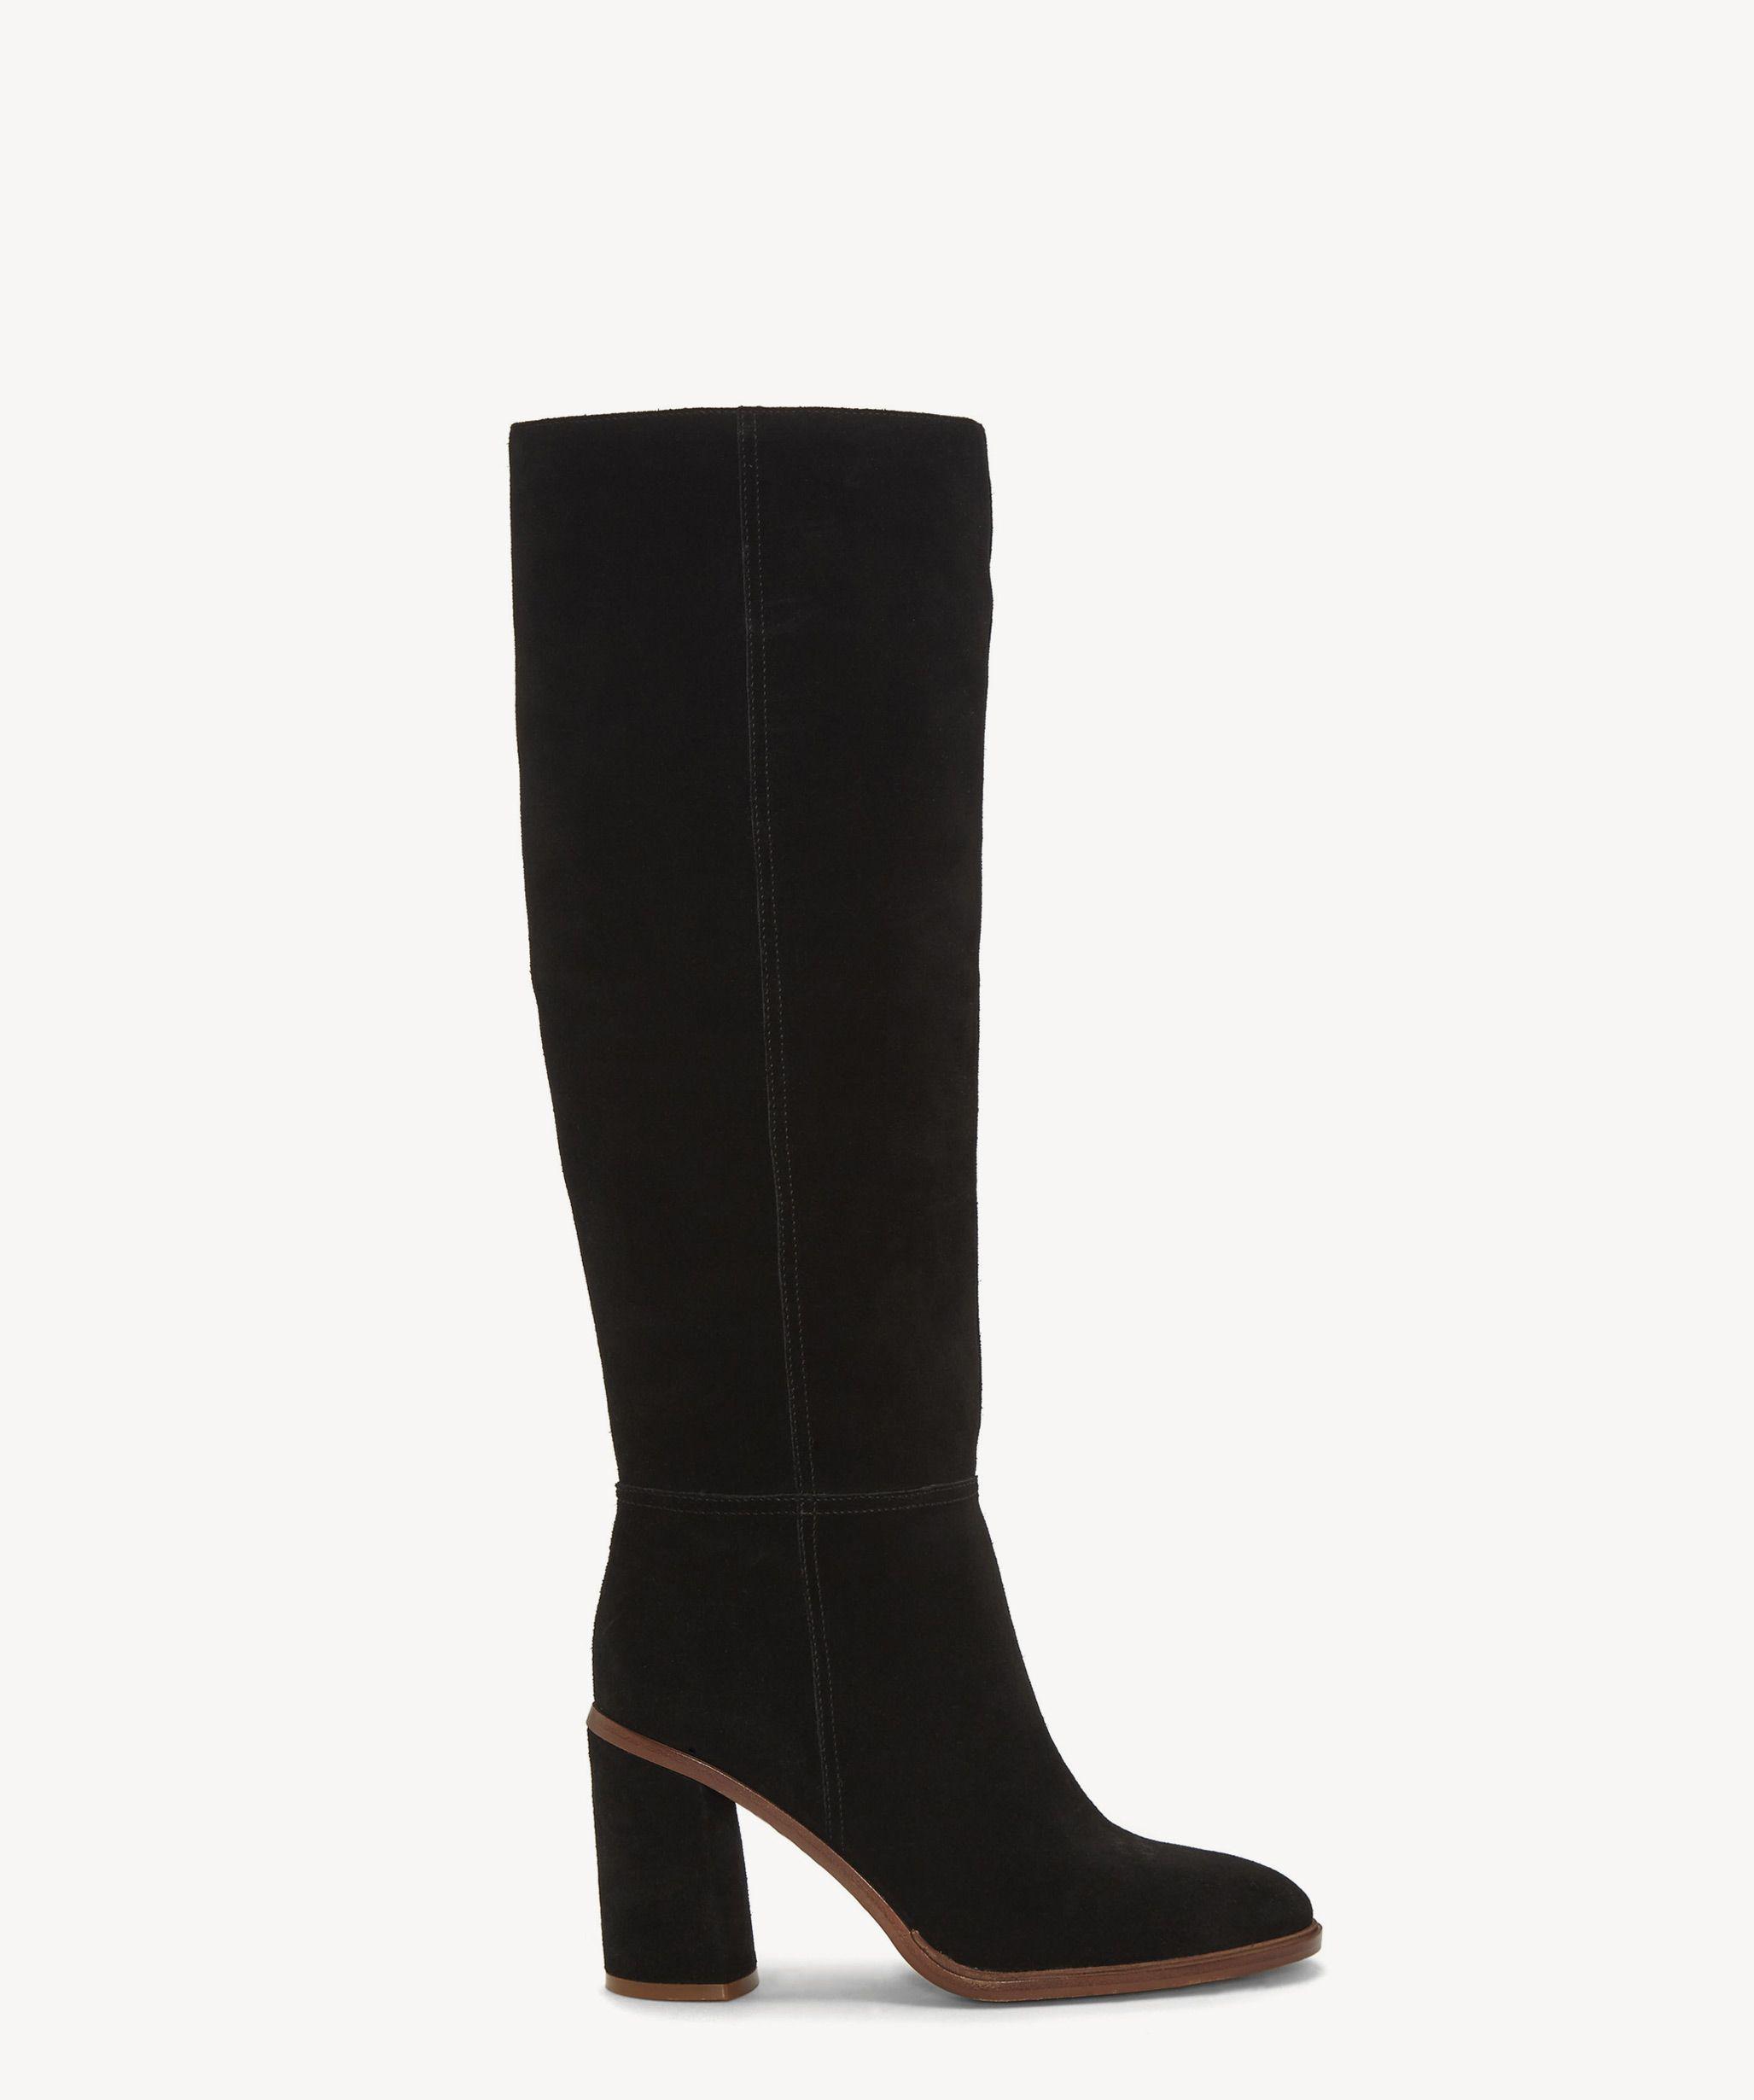 Vince-Camuto-DAMEERA-Knee-High-Block-Heel-Fashion-Dress-Boots thumbnail 5